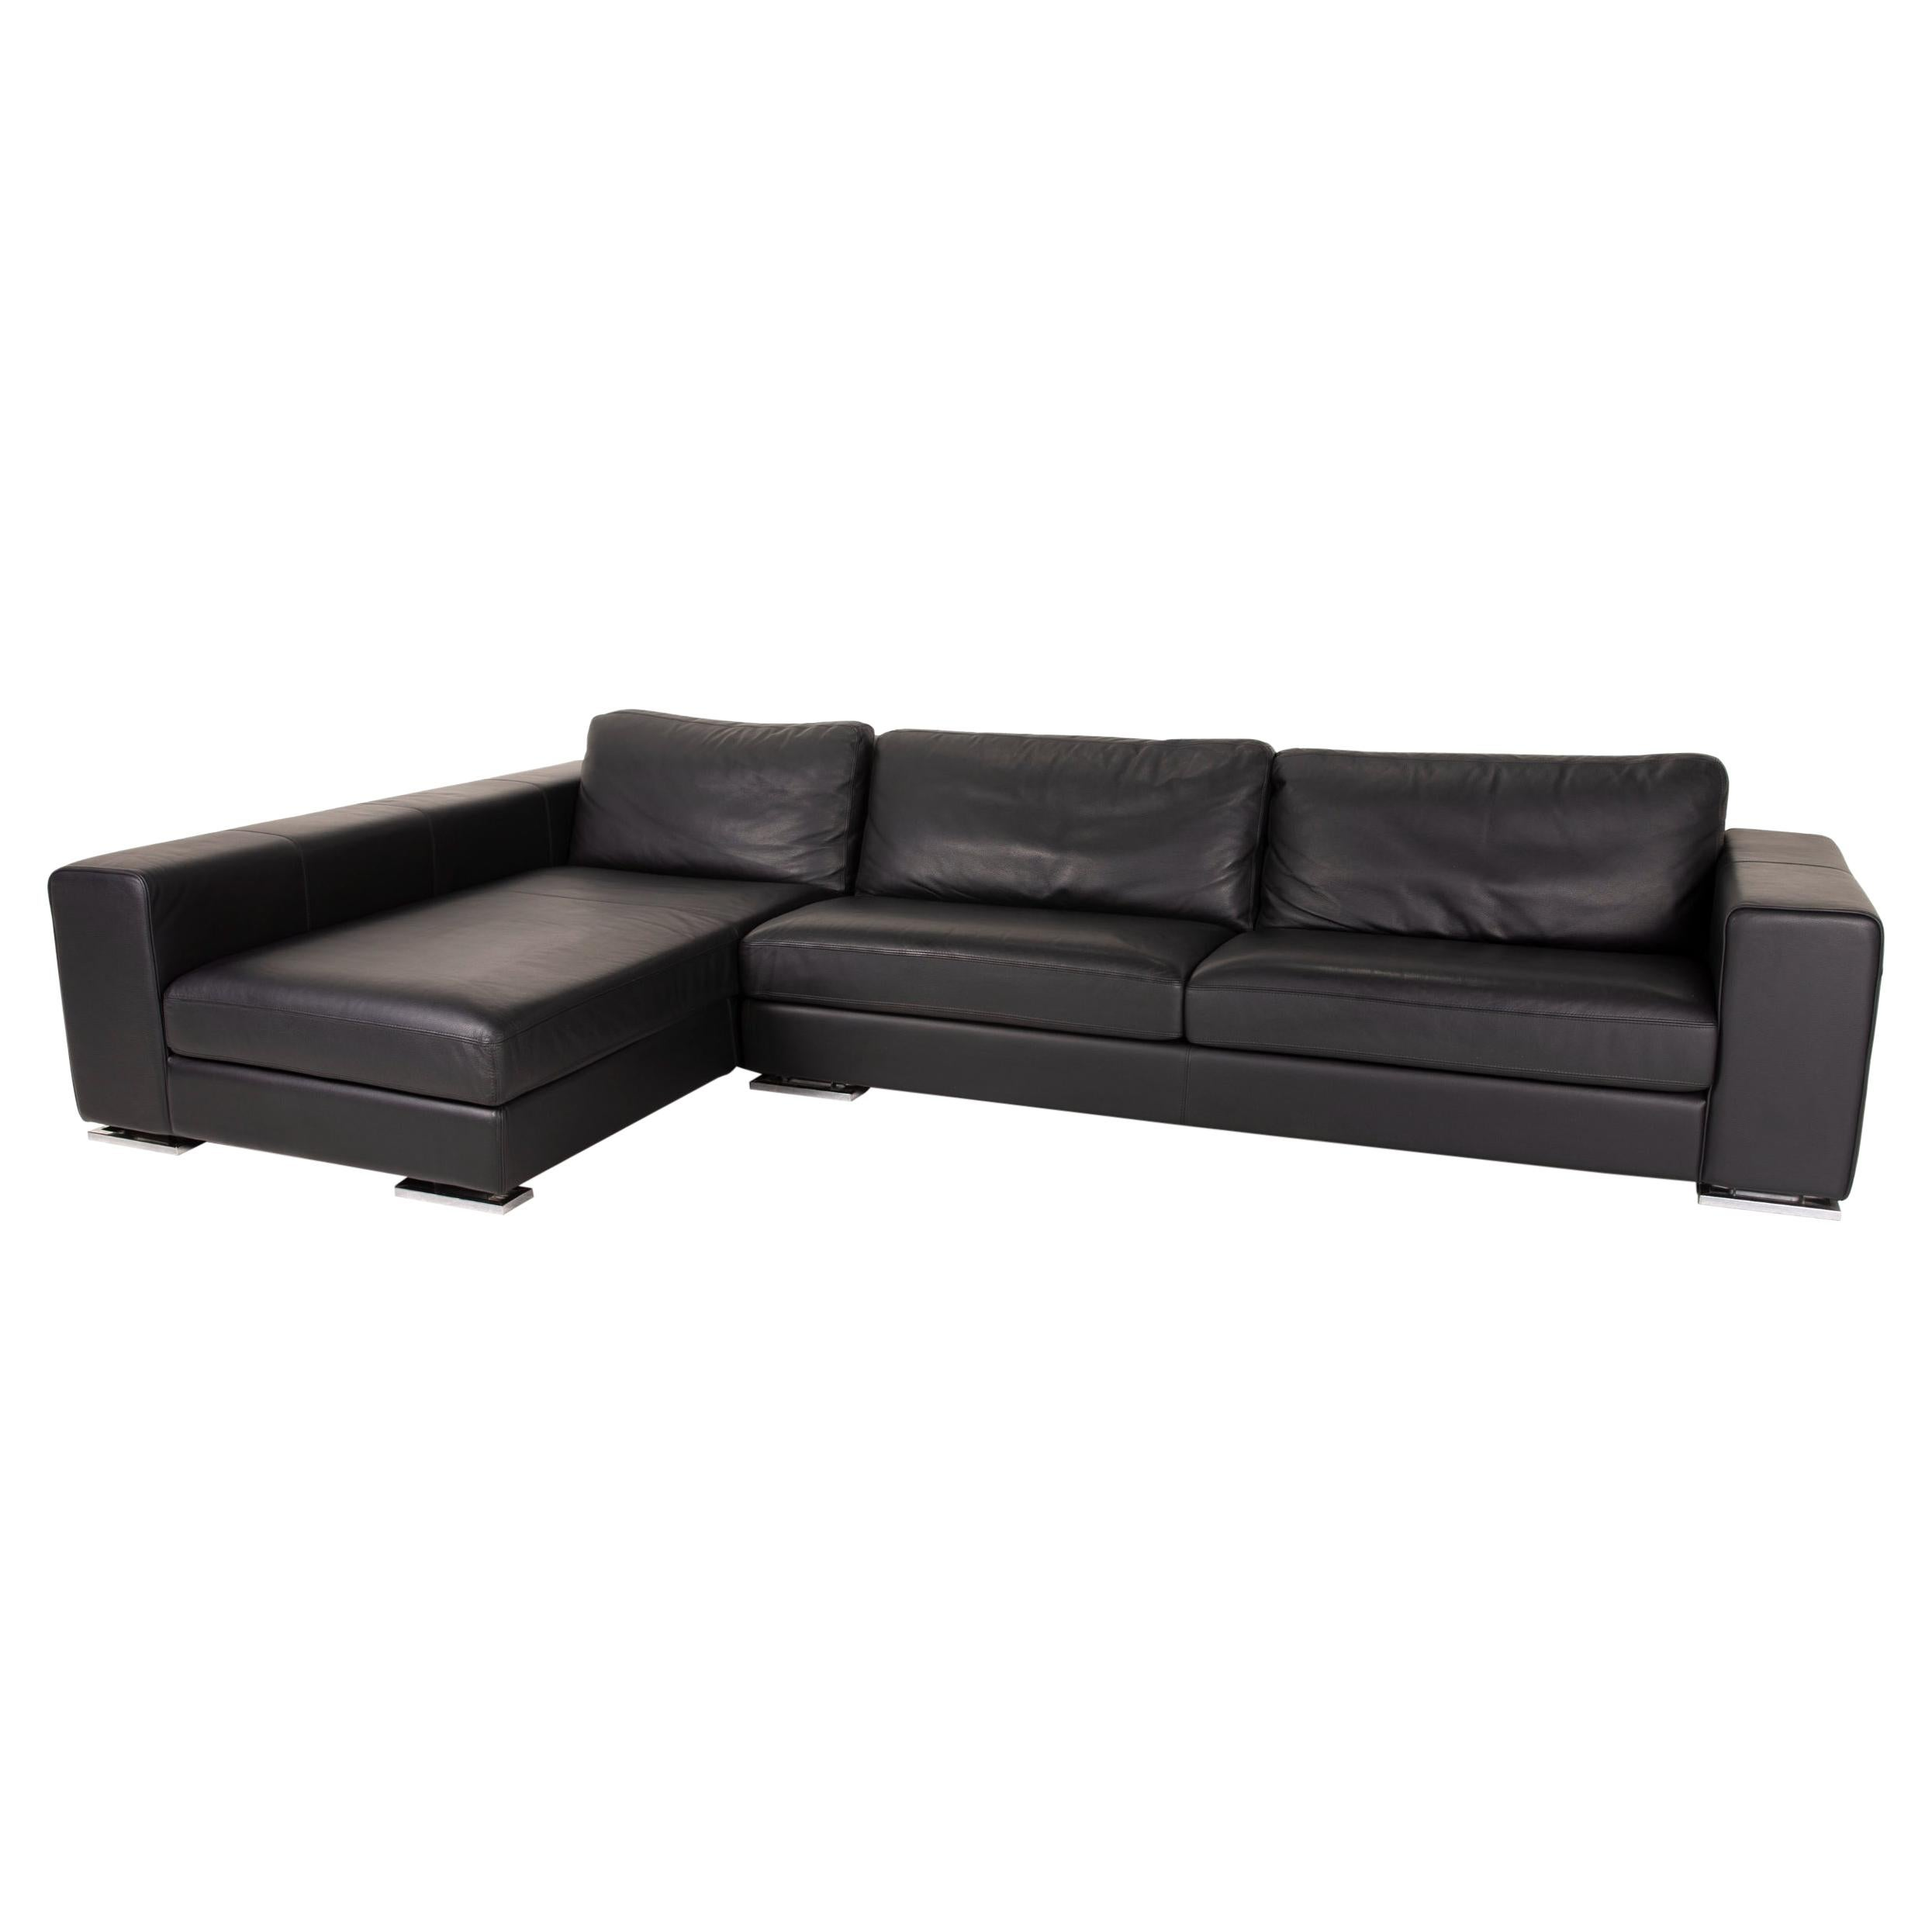 Who's Perfect Manhattan Leather Sofa Black Corner Sofa Couch